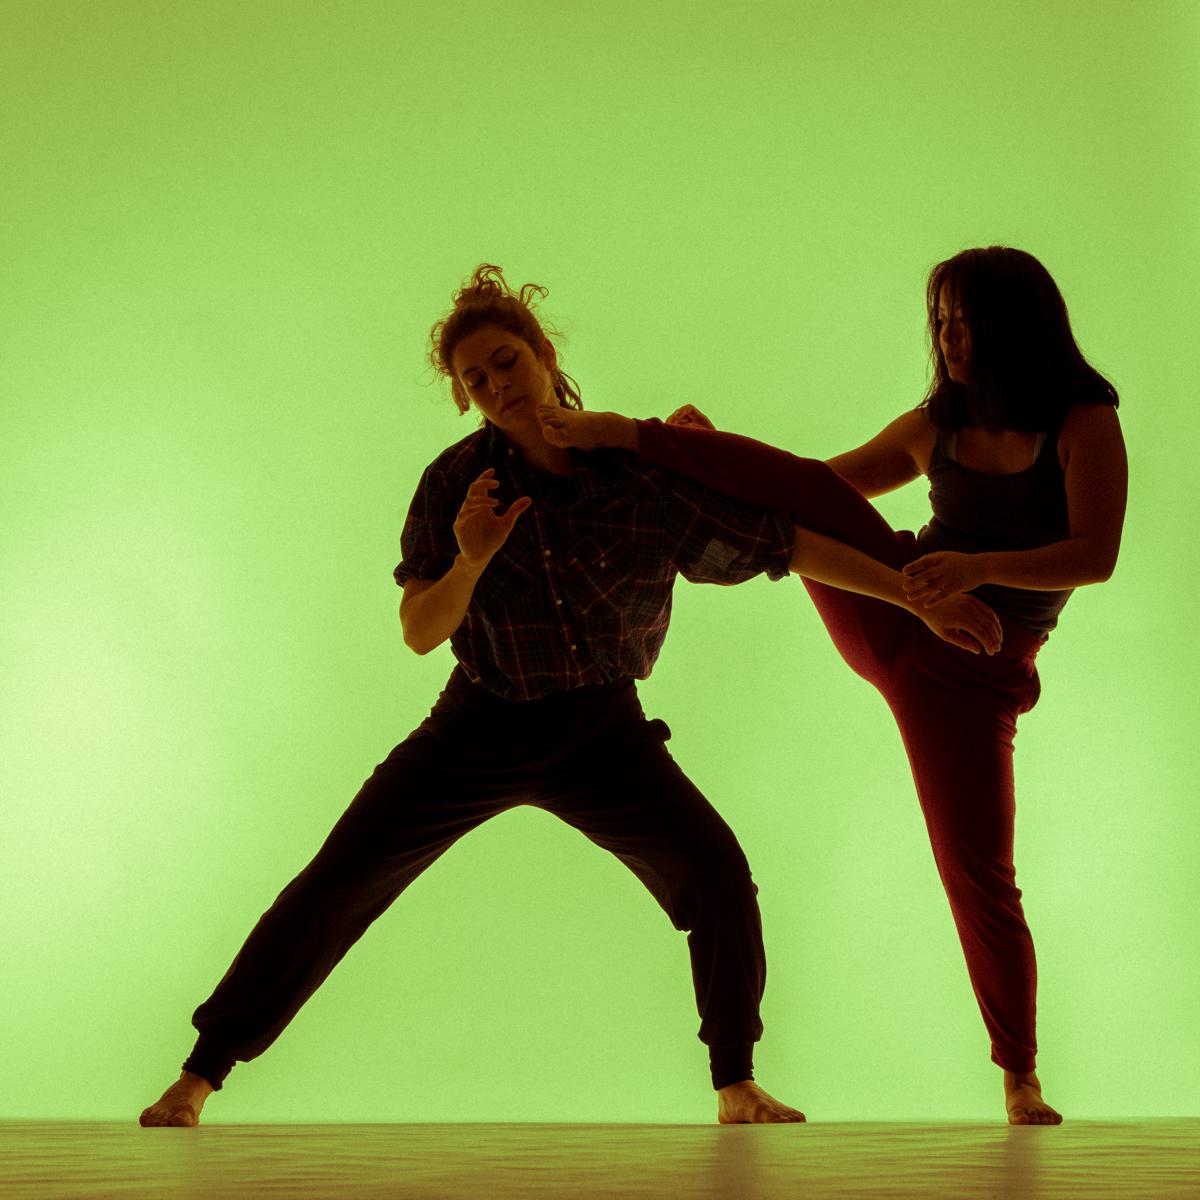 stephen-rusk-alexandra-pholien-leanne-vincent-contemporary-dance-18-10-44.jpg